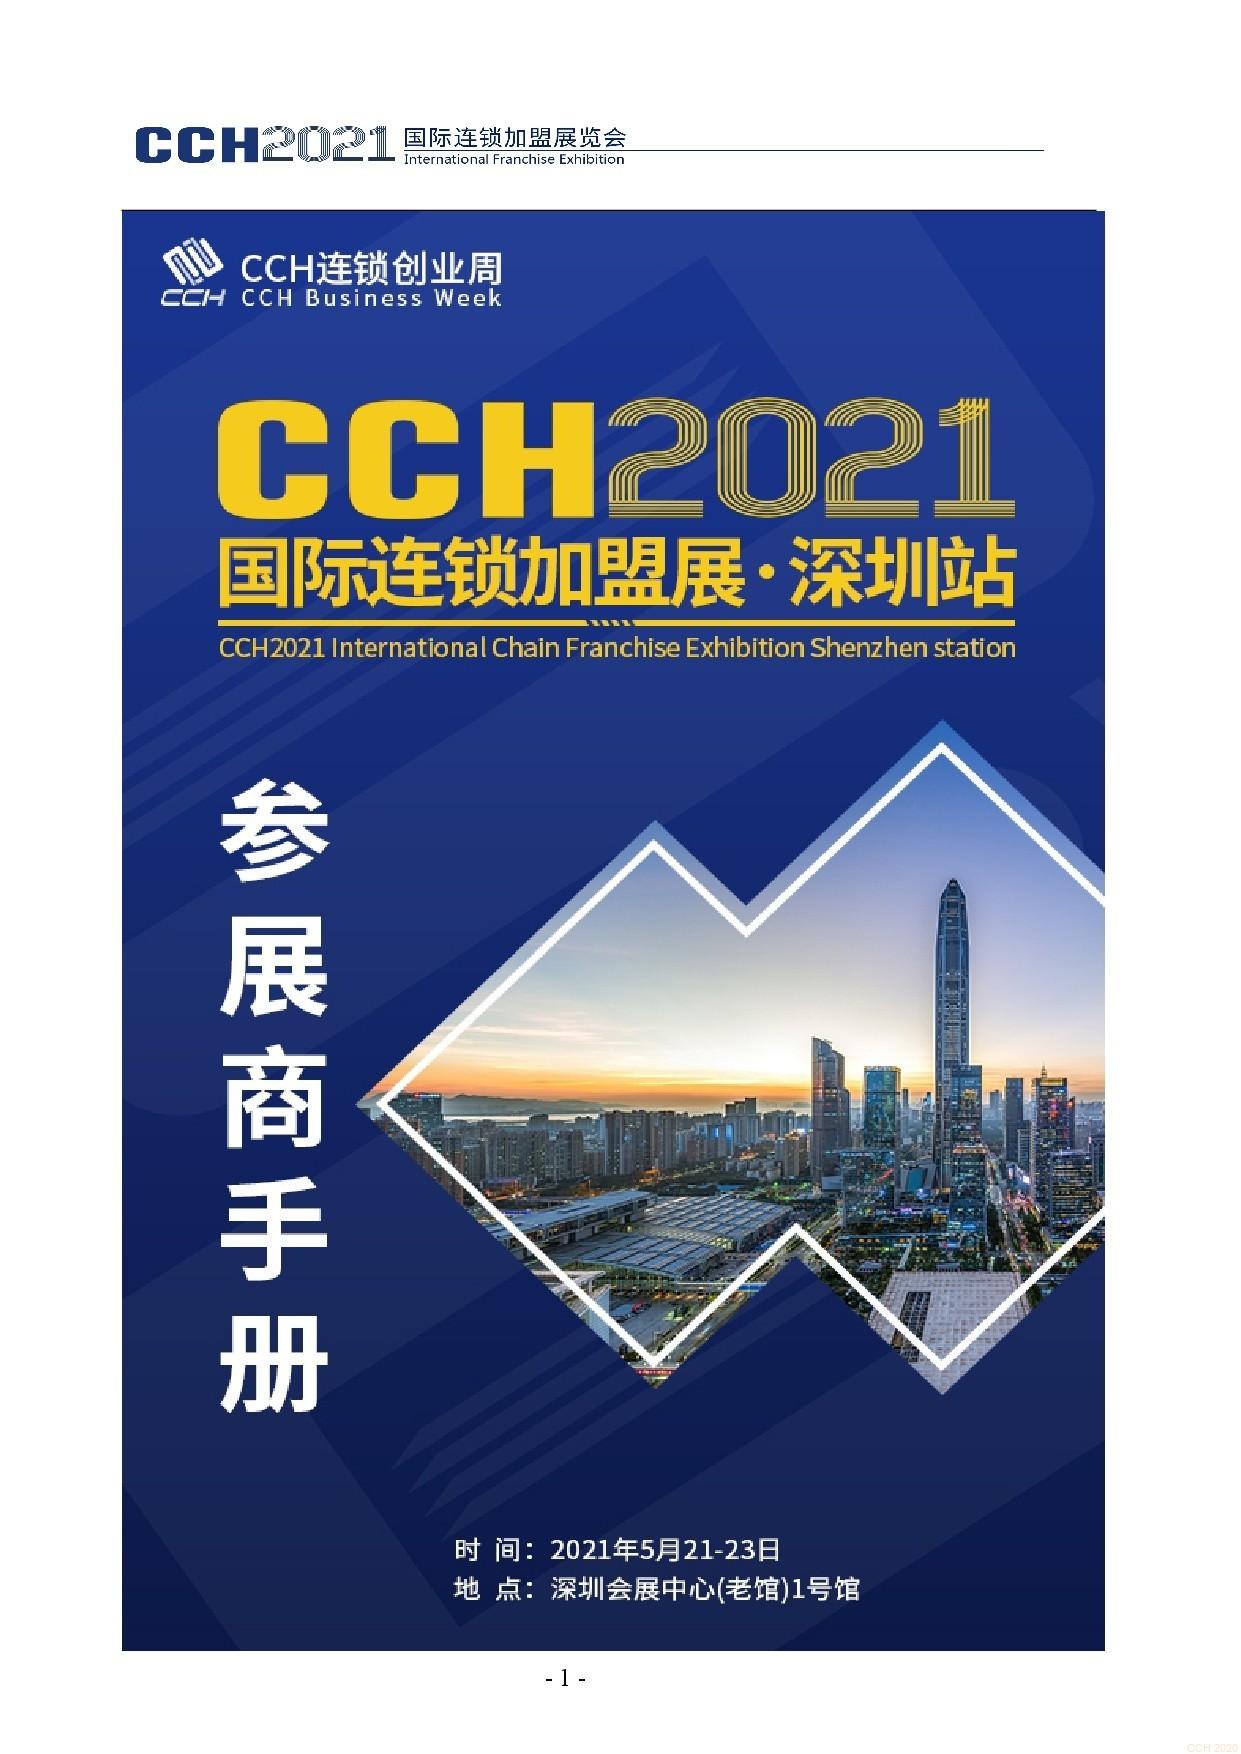 0416CCH深圳展参展商手册4.16-001.jpg